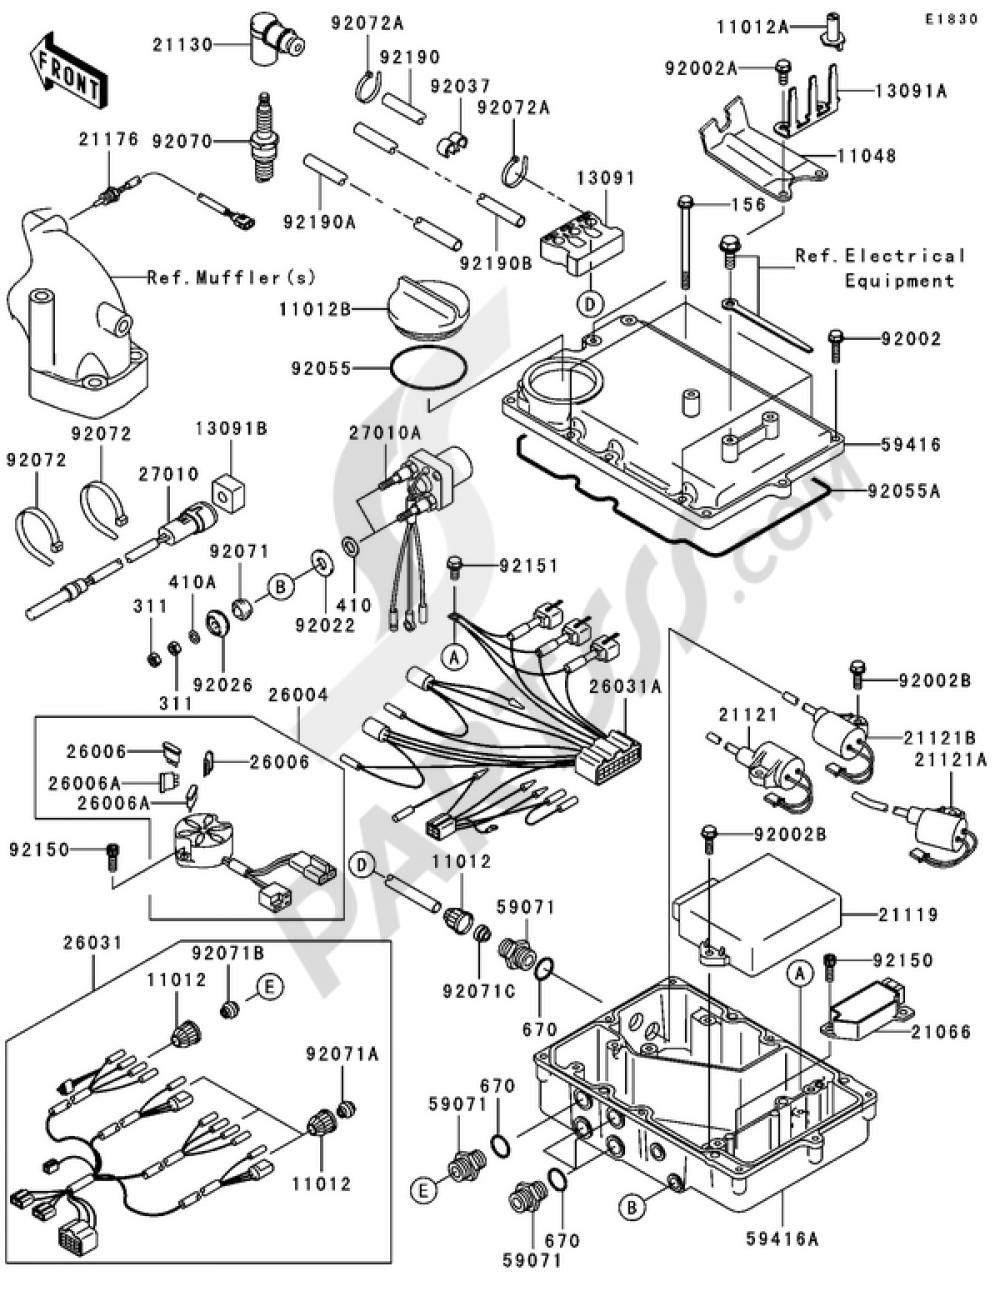 Ignition System(1/2) Kawasaki JET SKI 900 STX 2004